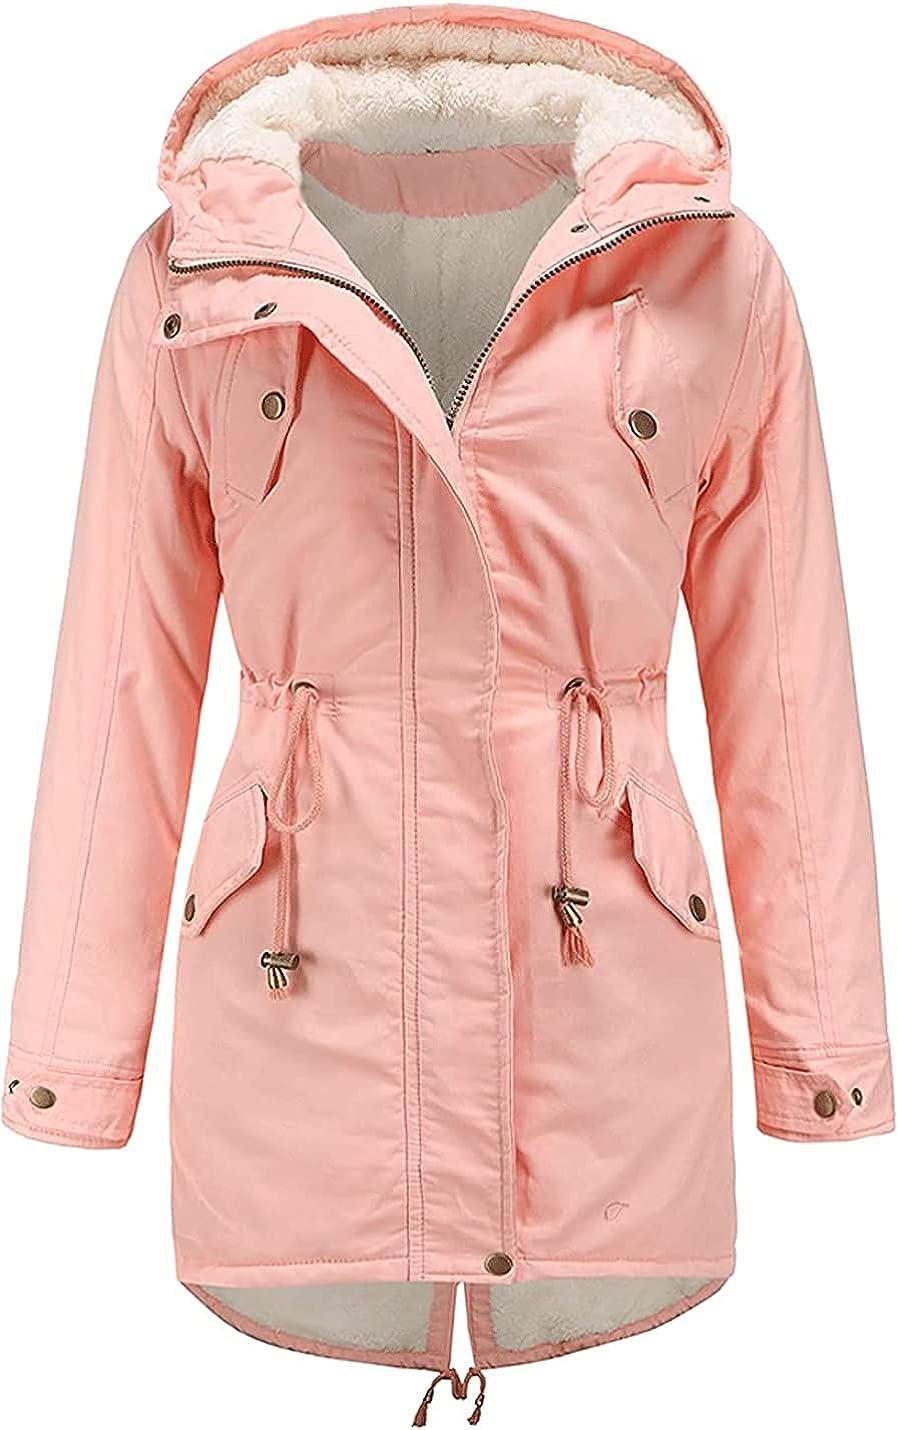 PAODIKUAI Womens Fleece Lined Hooded Parka Jacket Faux Fur Cotton Coat with Pockets